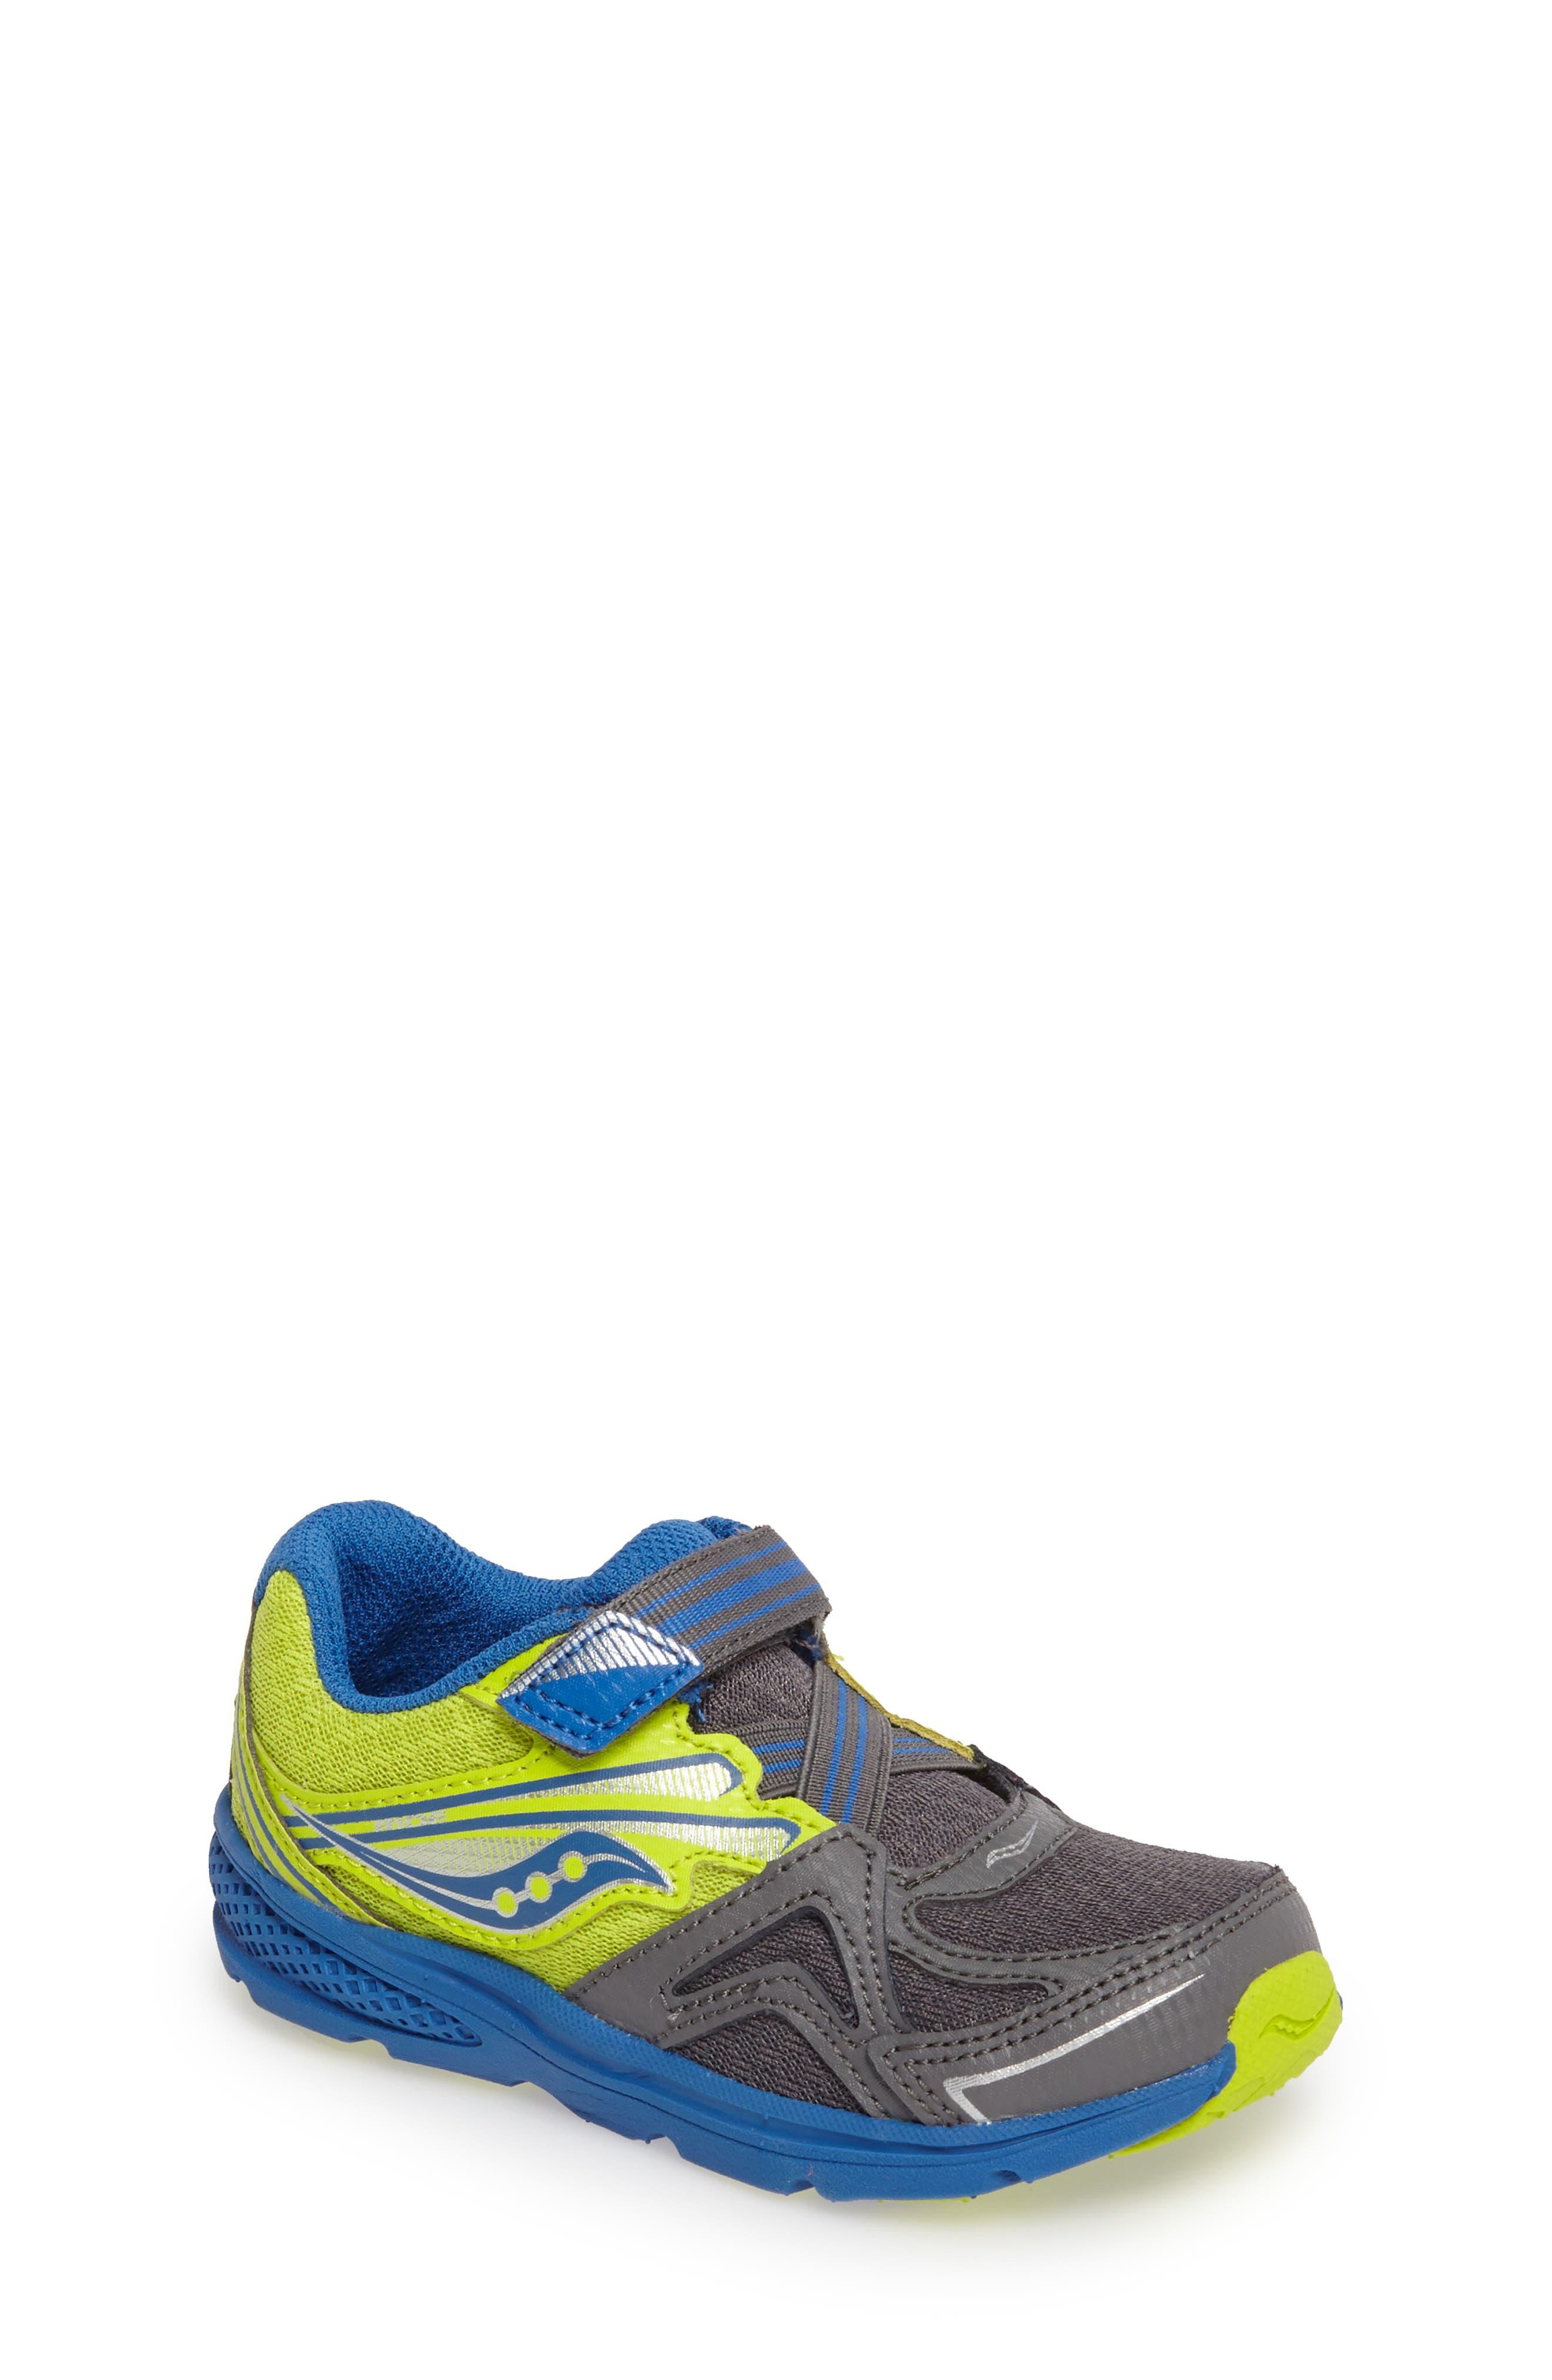 'Ride' Sneaker,                             Main thumbnail 1, color,                             Grey/ Lime